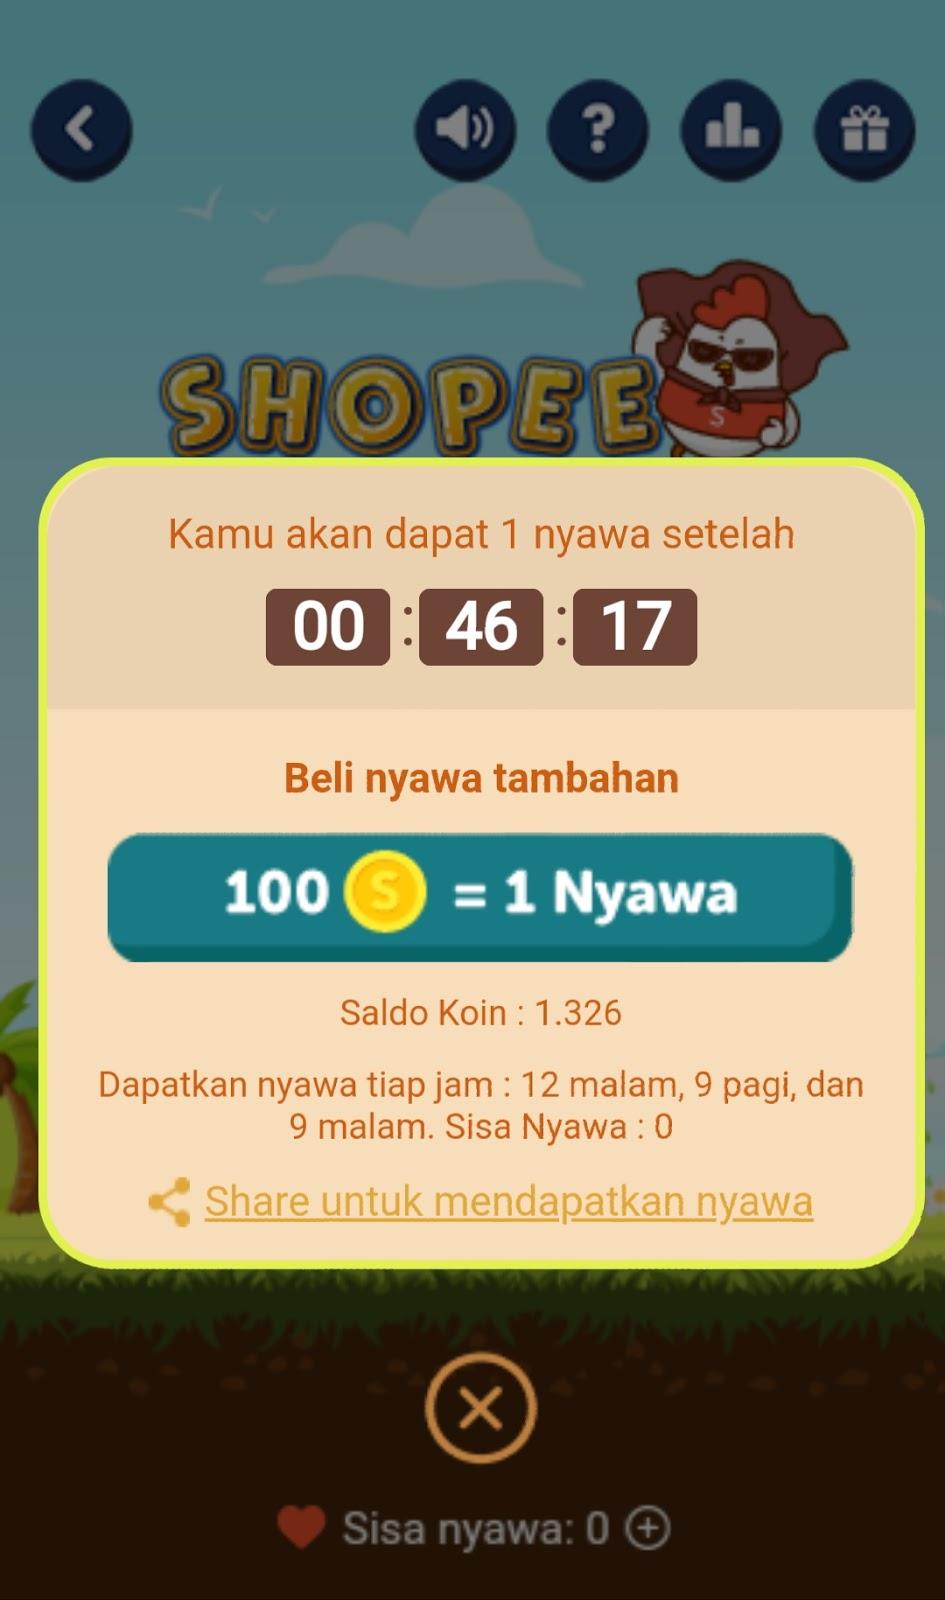 Shopee flappy Shopee Games